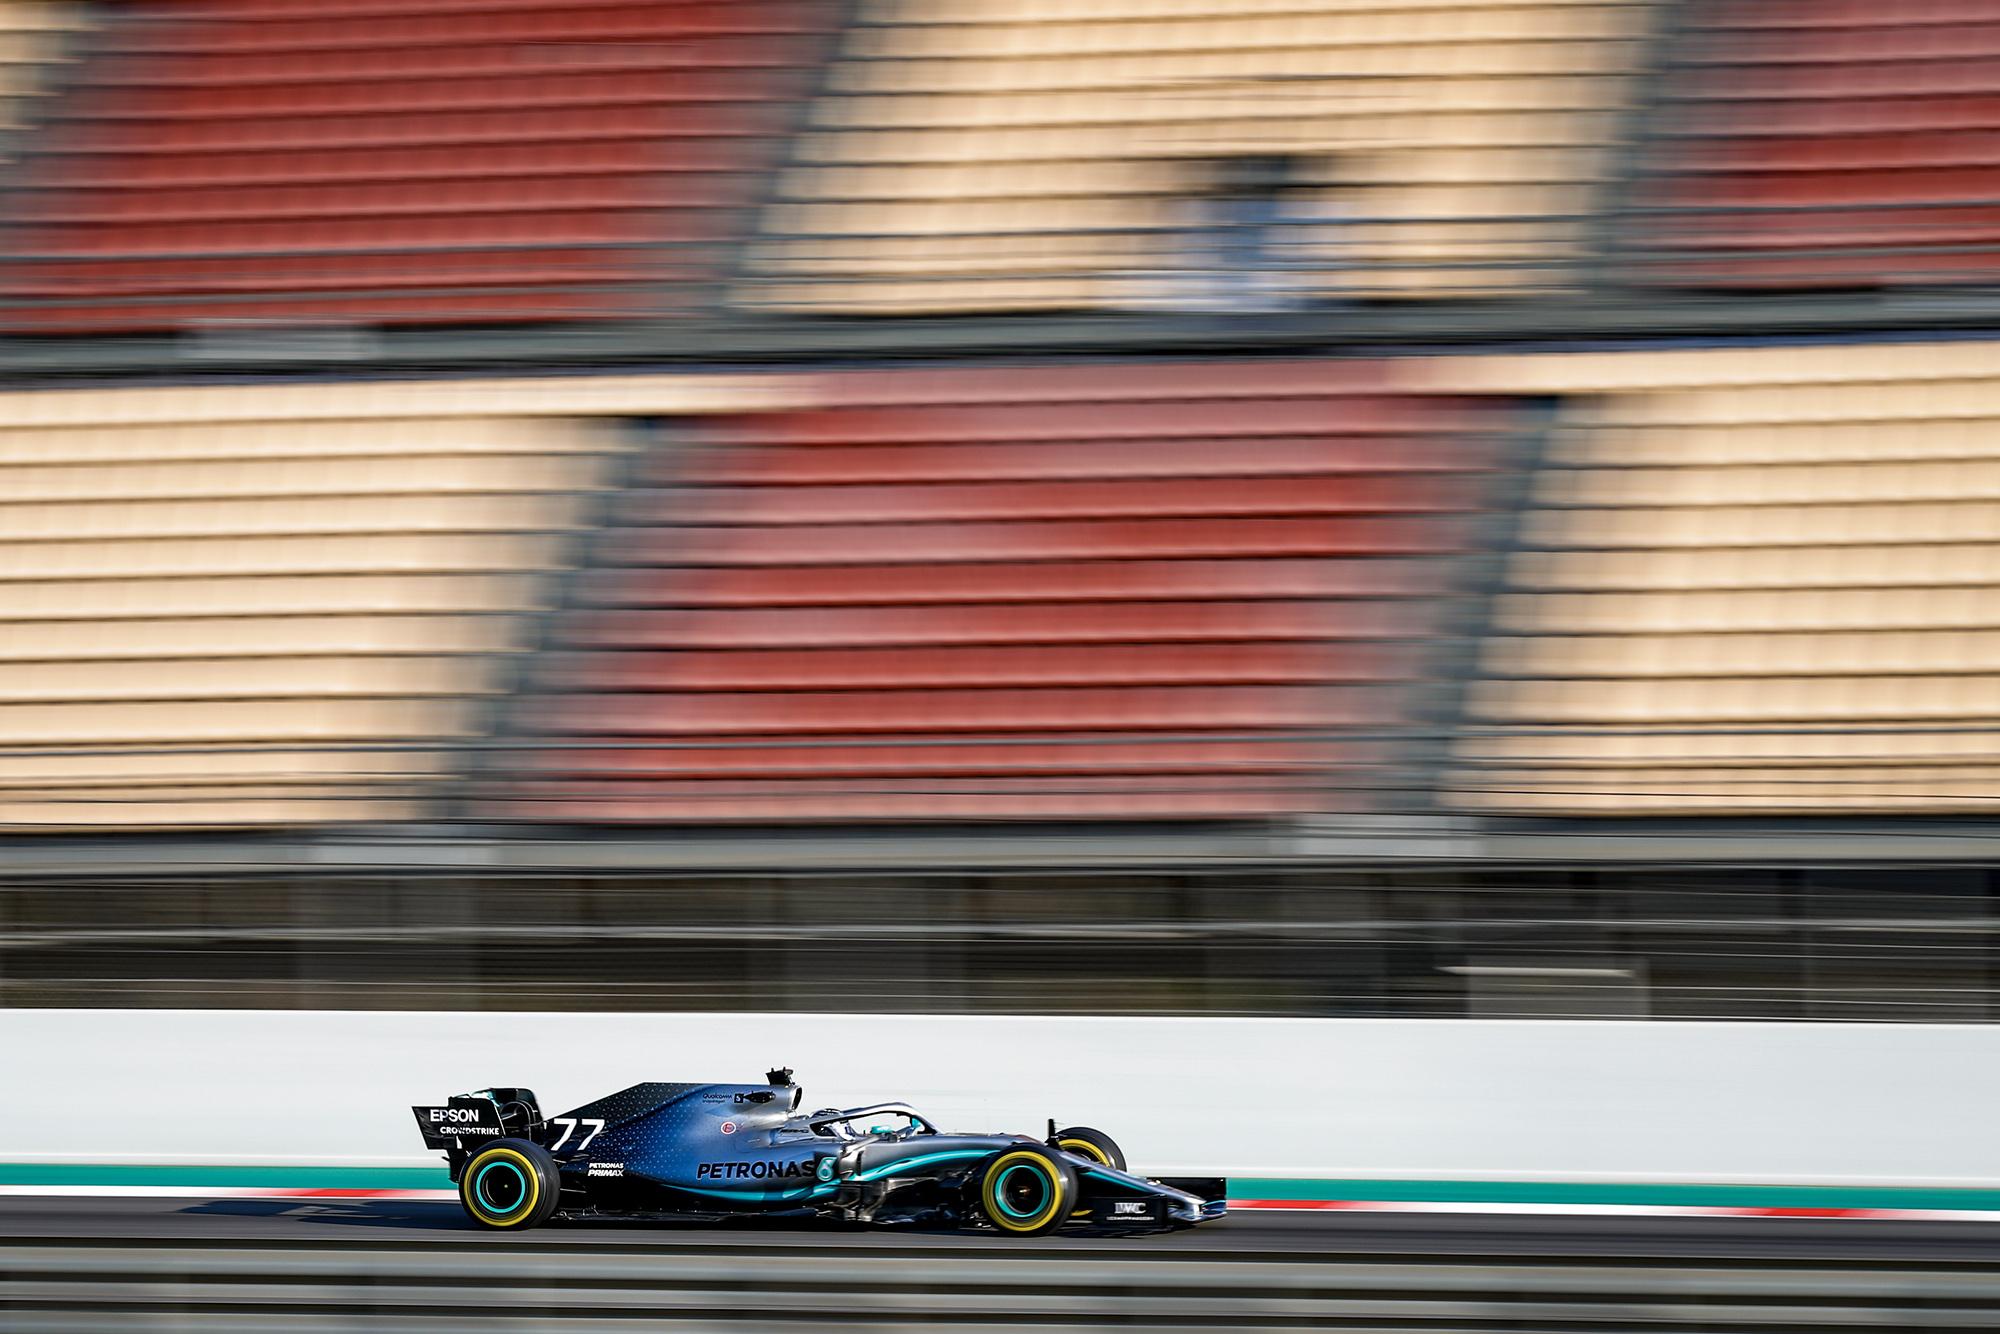 Valtteri Bottas in 2019 F1 preseason testing